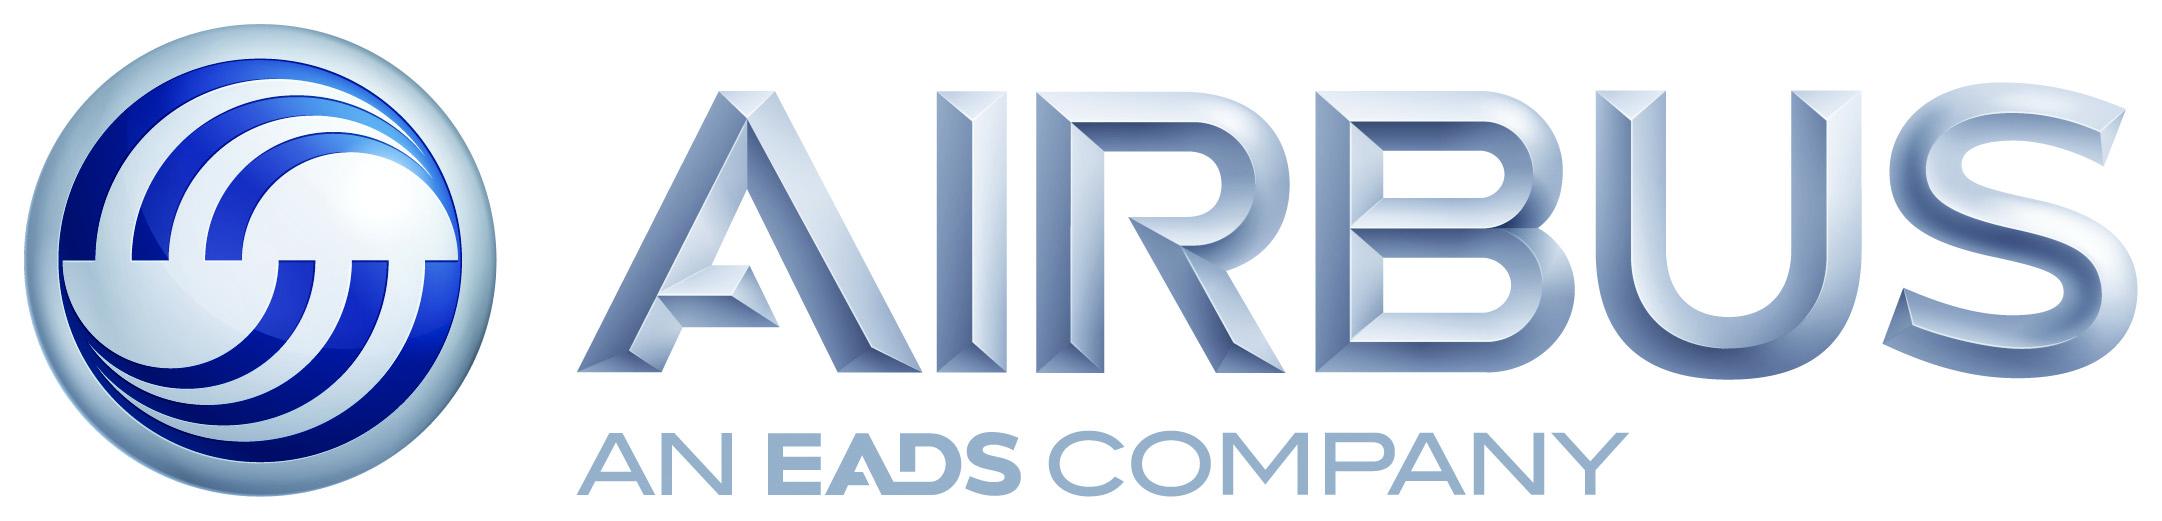 https://i1.wp.com/www.defesaaereanaval.com.br/wp-content/uploads/2014/04/airbus-logo.jpg